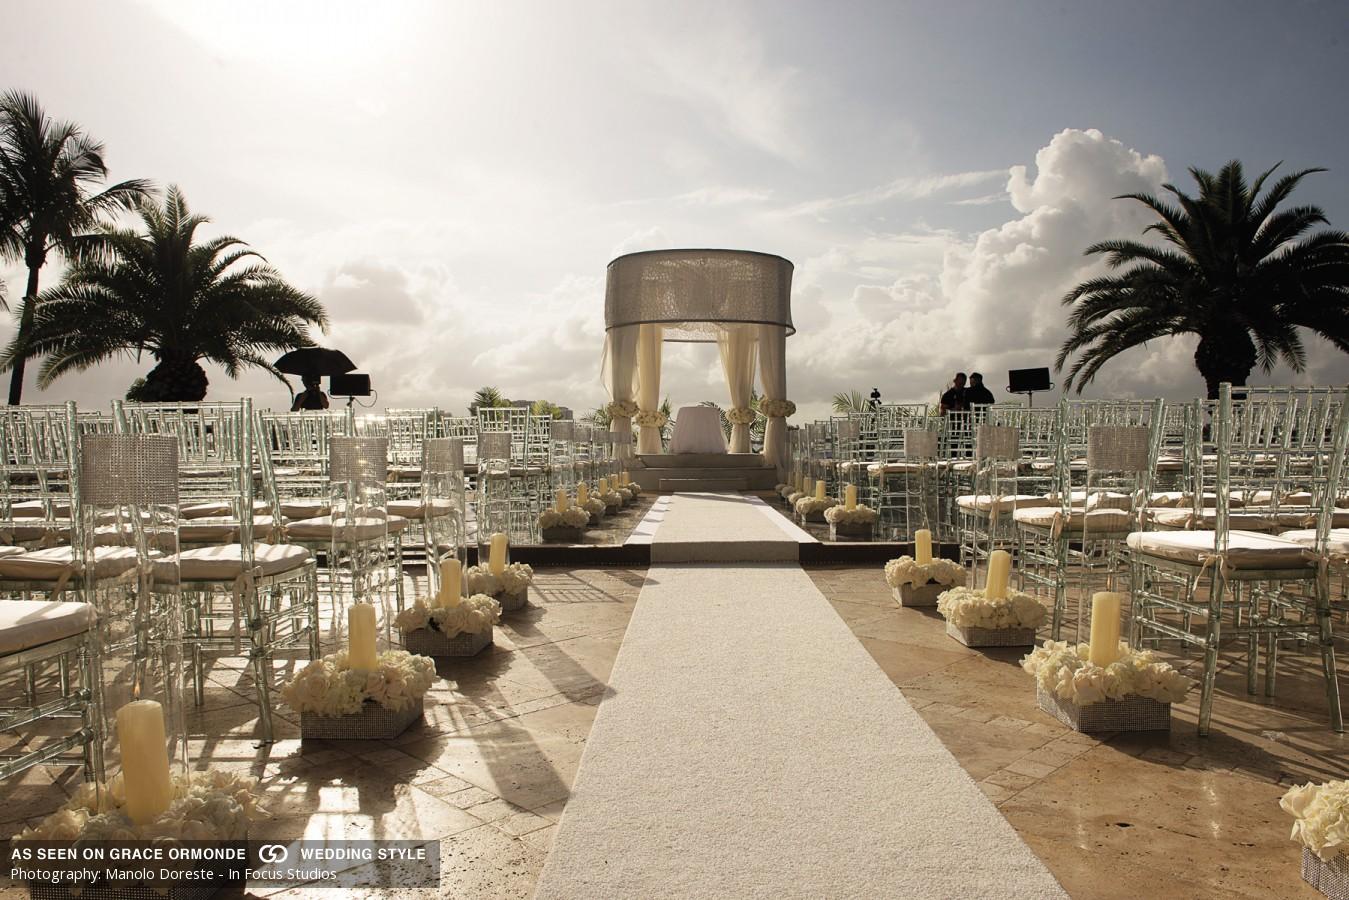 manolo-doreste-wedding-ss14-010.jpg